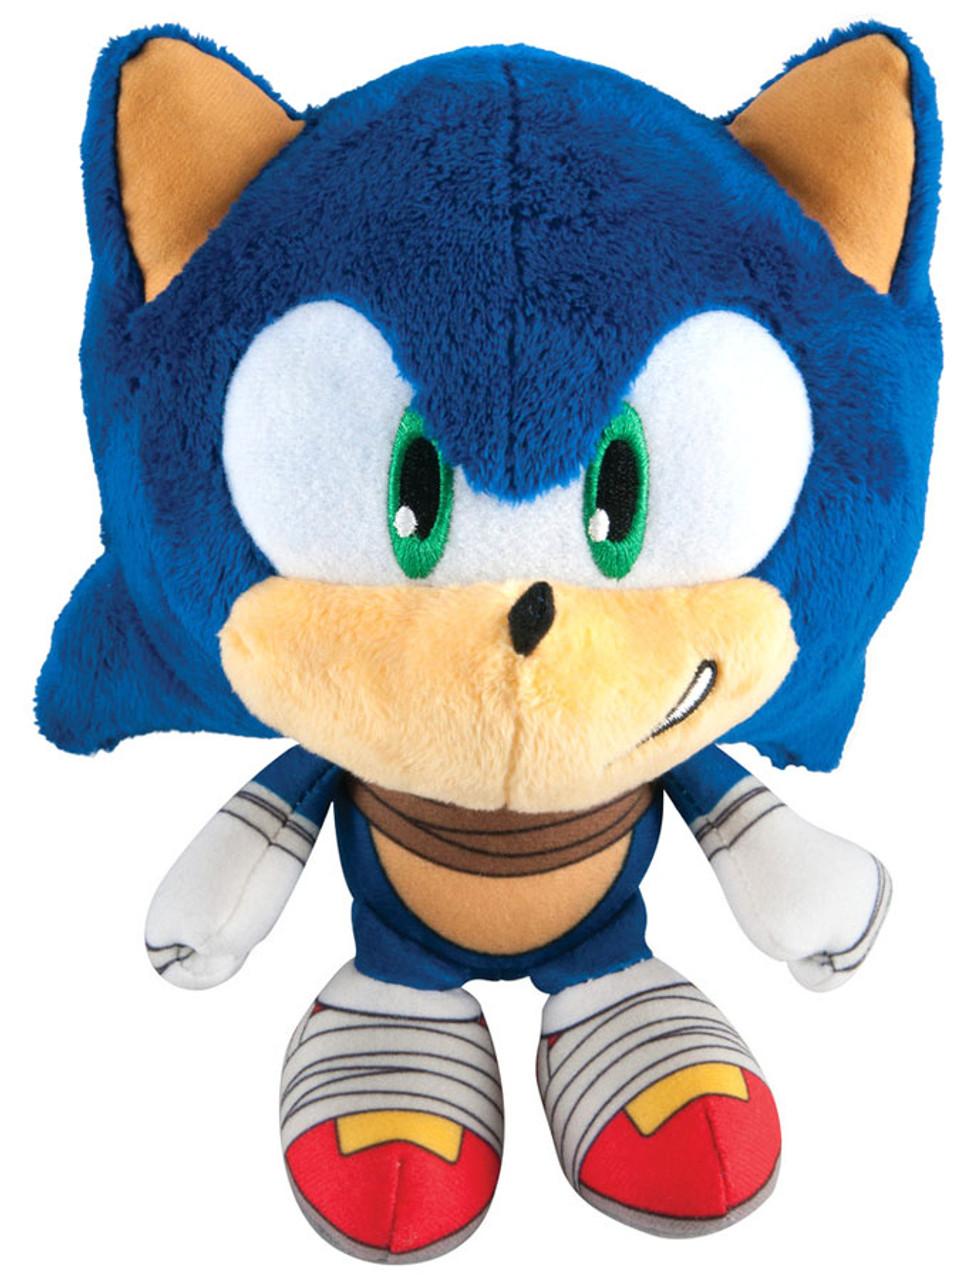 Sonic The Hedgehog Sonic Boom Sonic Super Deformed 6 Plush Tomy Inc Toywiz